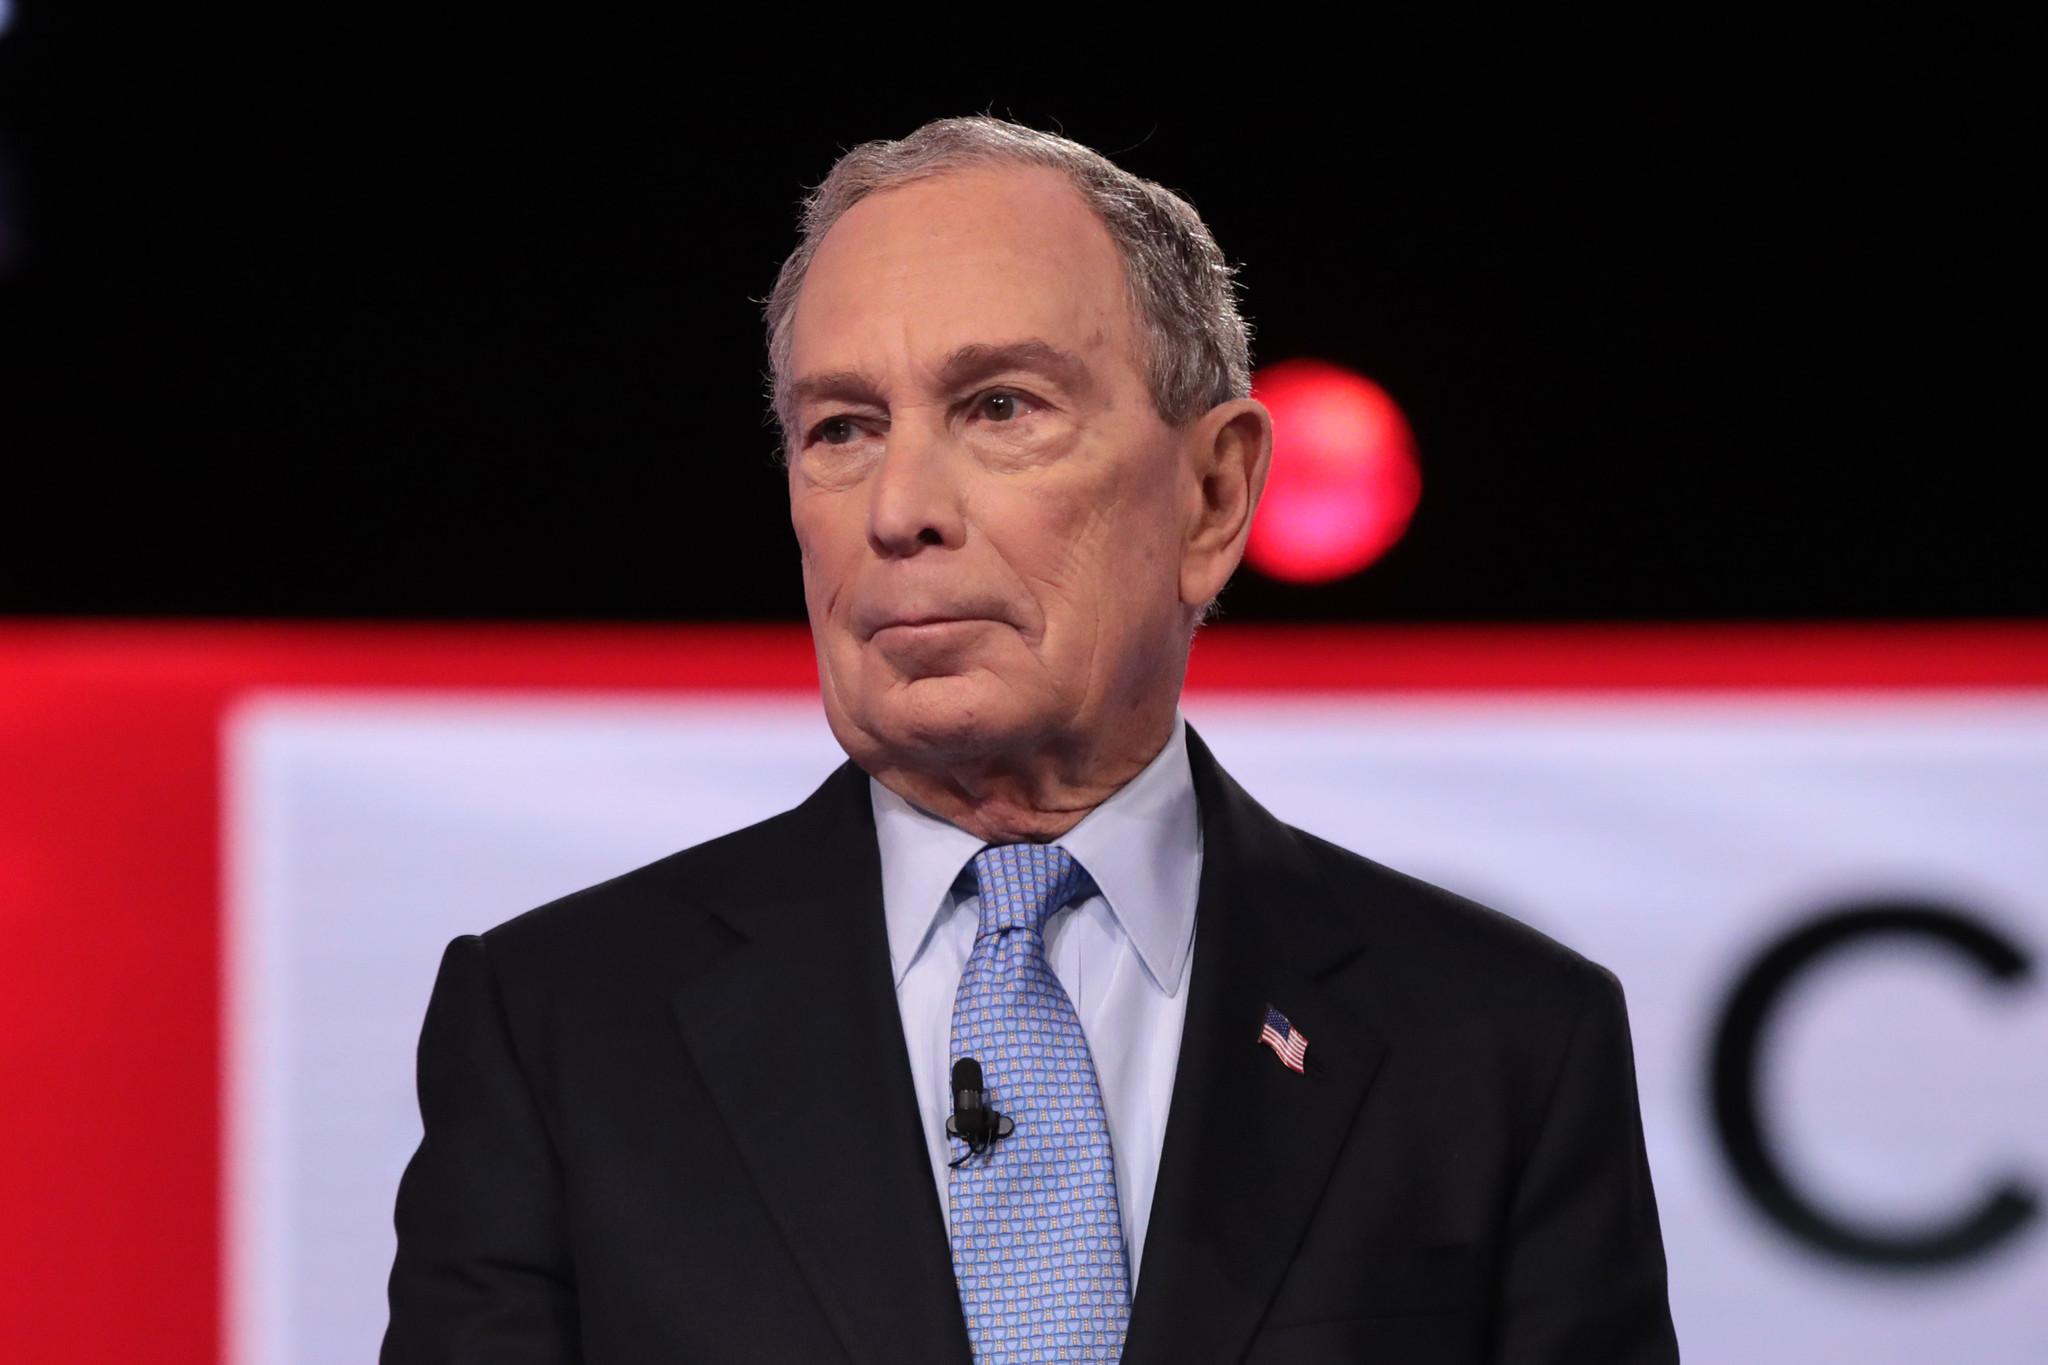 Michael Bloomberg's debate gaffe -- he 'bought' Congress